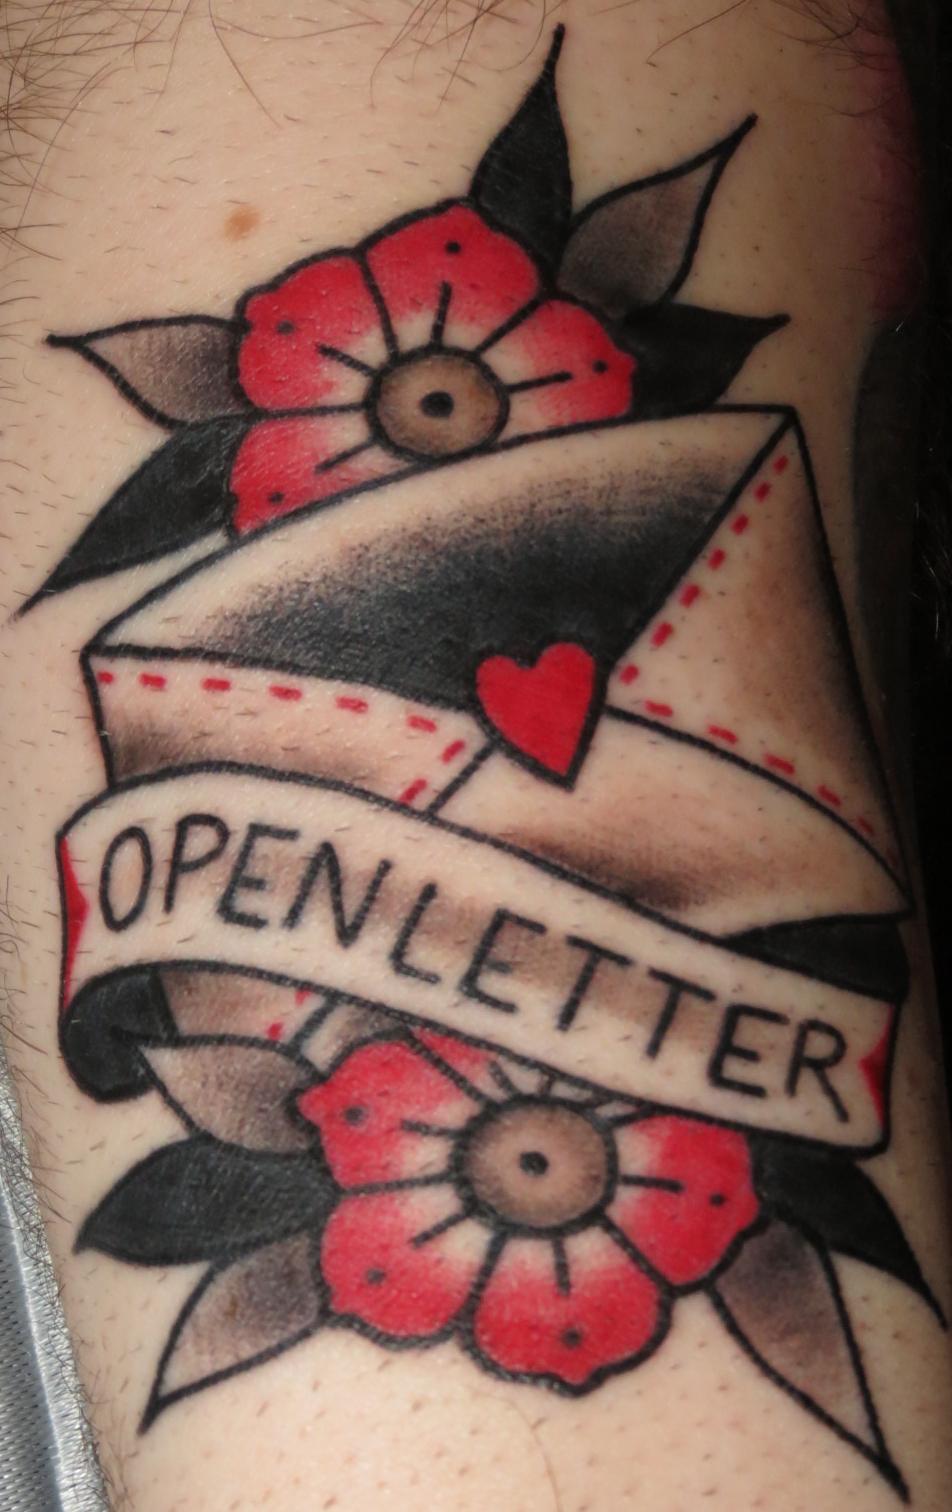 Open Letter Tattoo by Nelby2388 on DeviantArt